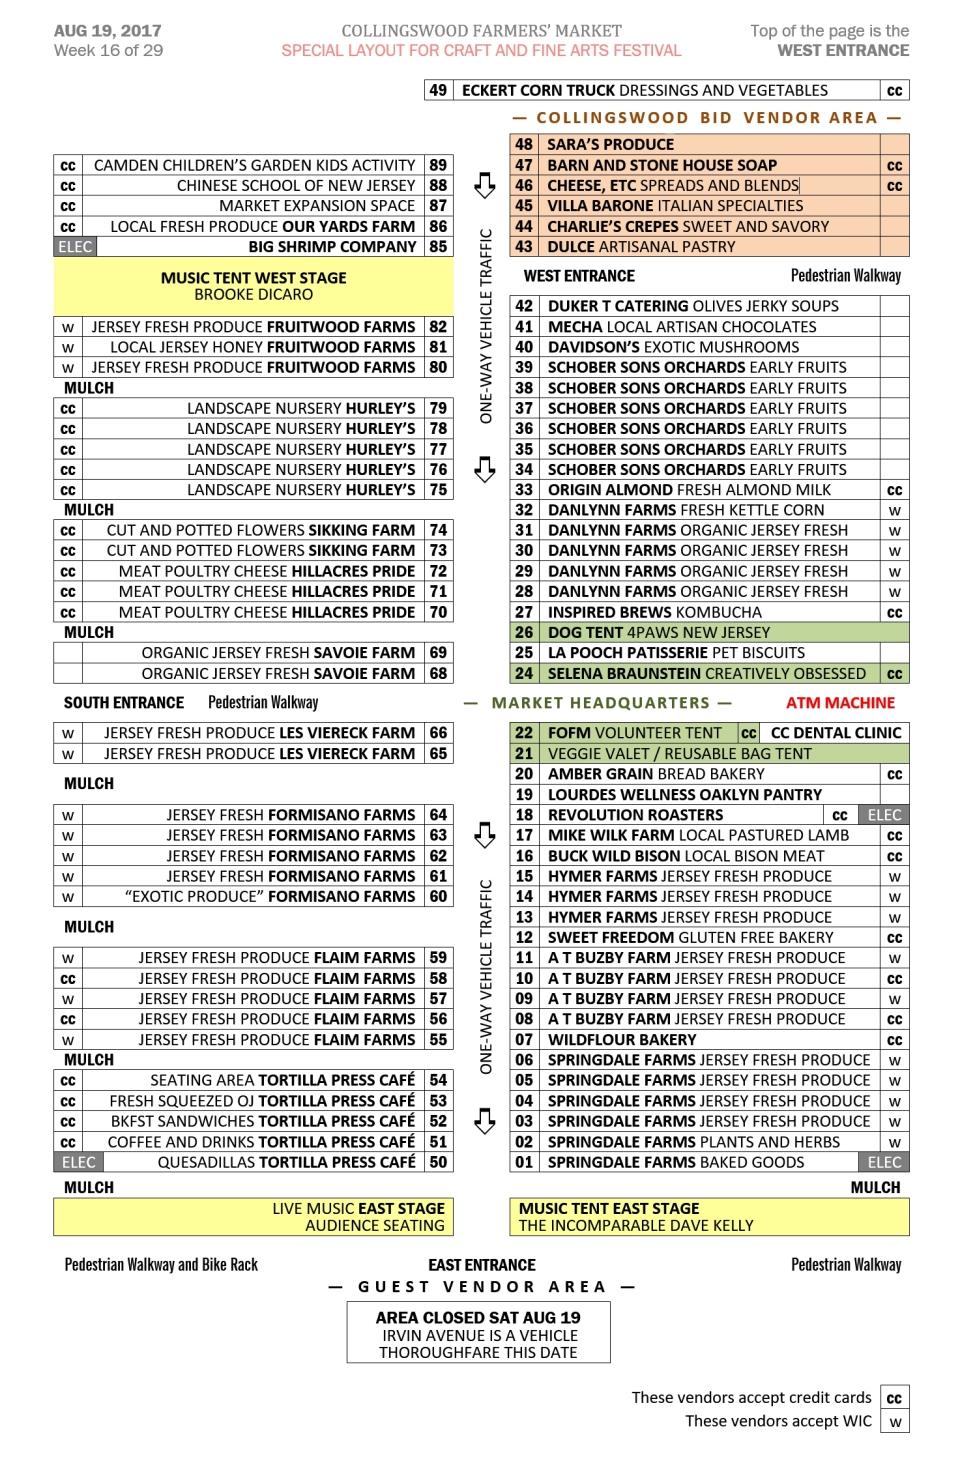 Site Plan SAT AUG 19